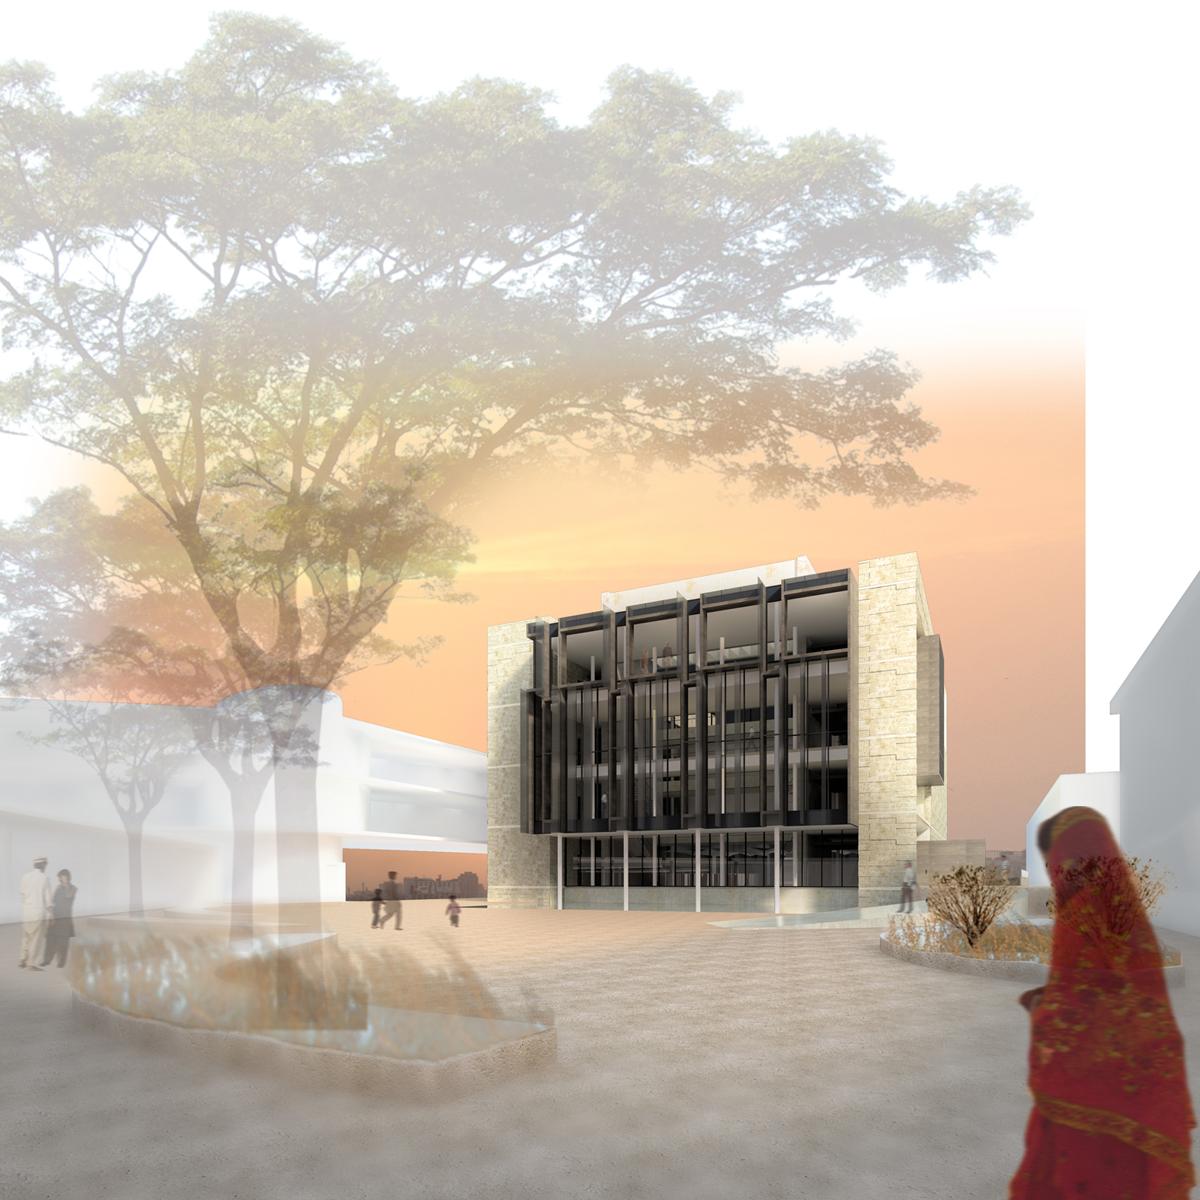 Isaac Southard_New .S. Embassy Islamabad_Courtyard Rendering.s.jpg